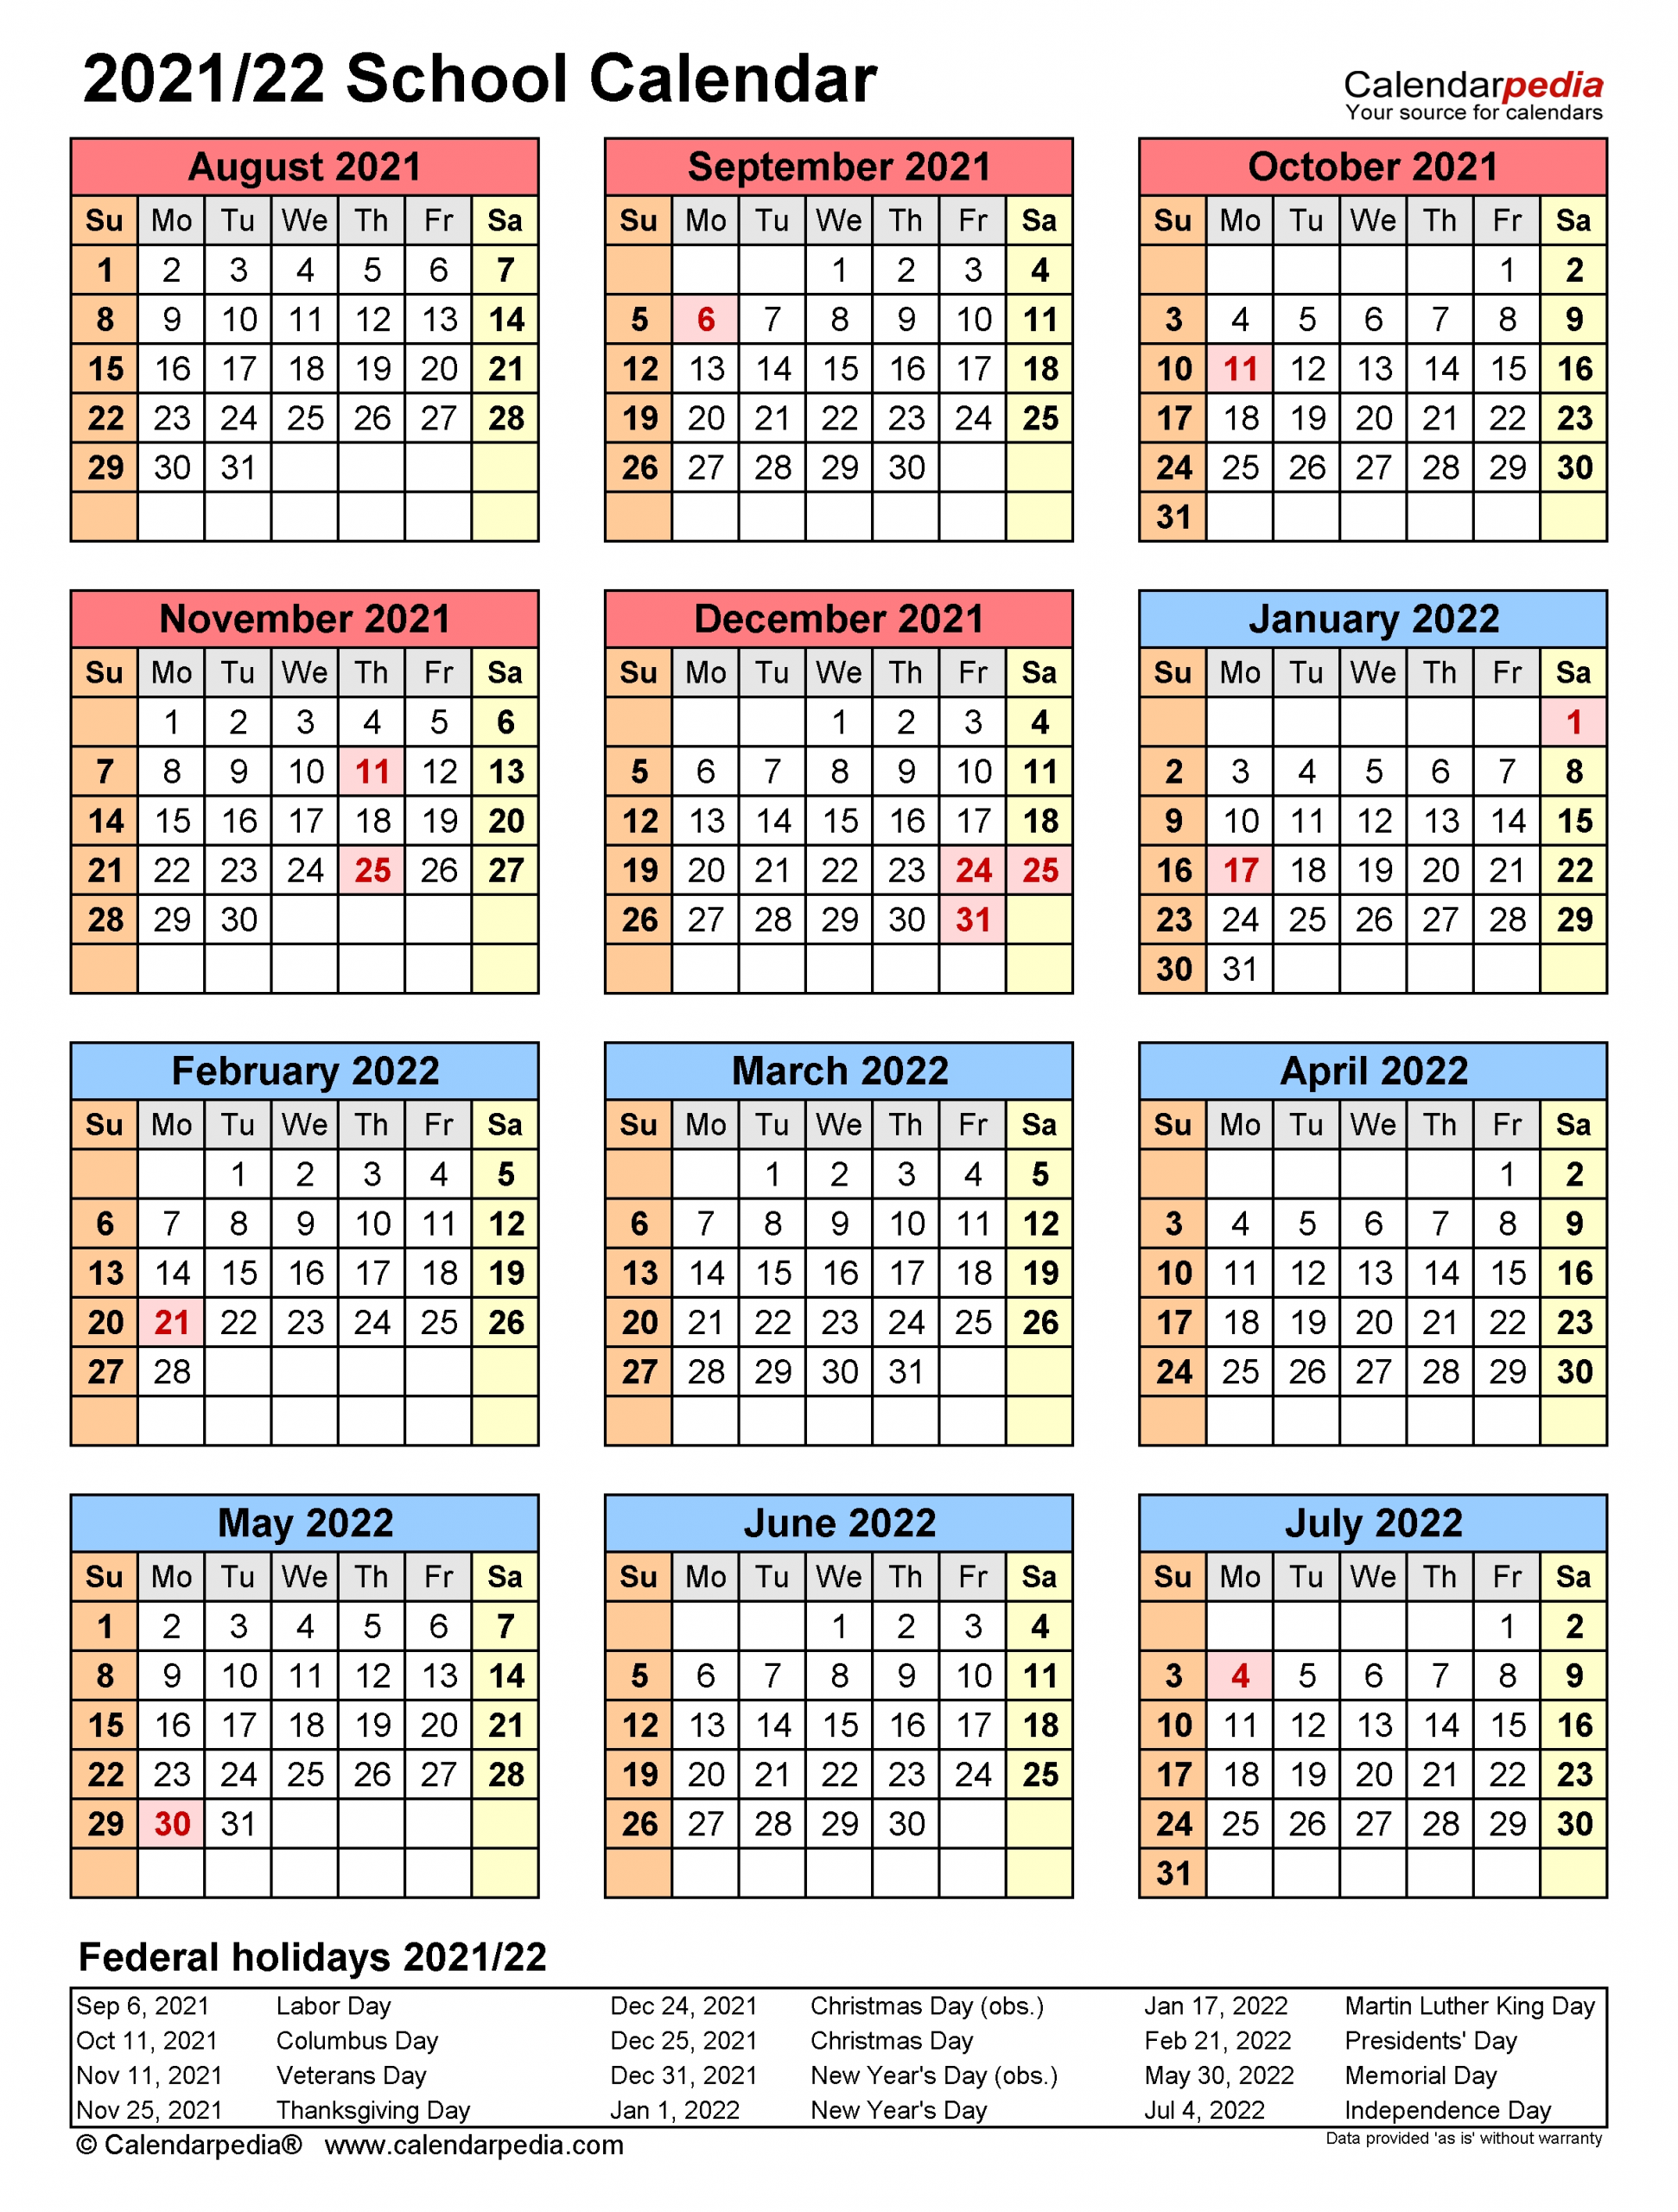 Fsu Holiday Calendar 2022.Printable 2021 2022 School Calendar Best Calendar Example